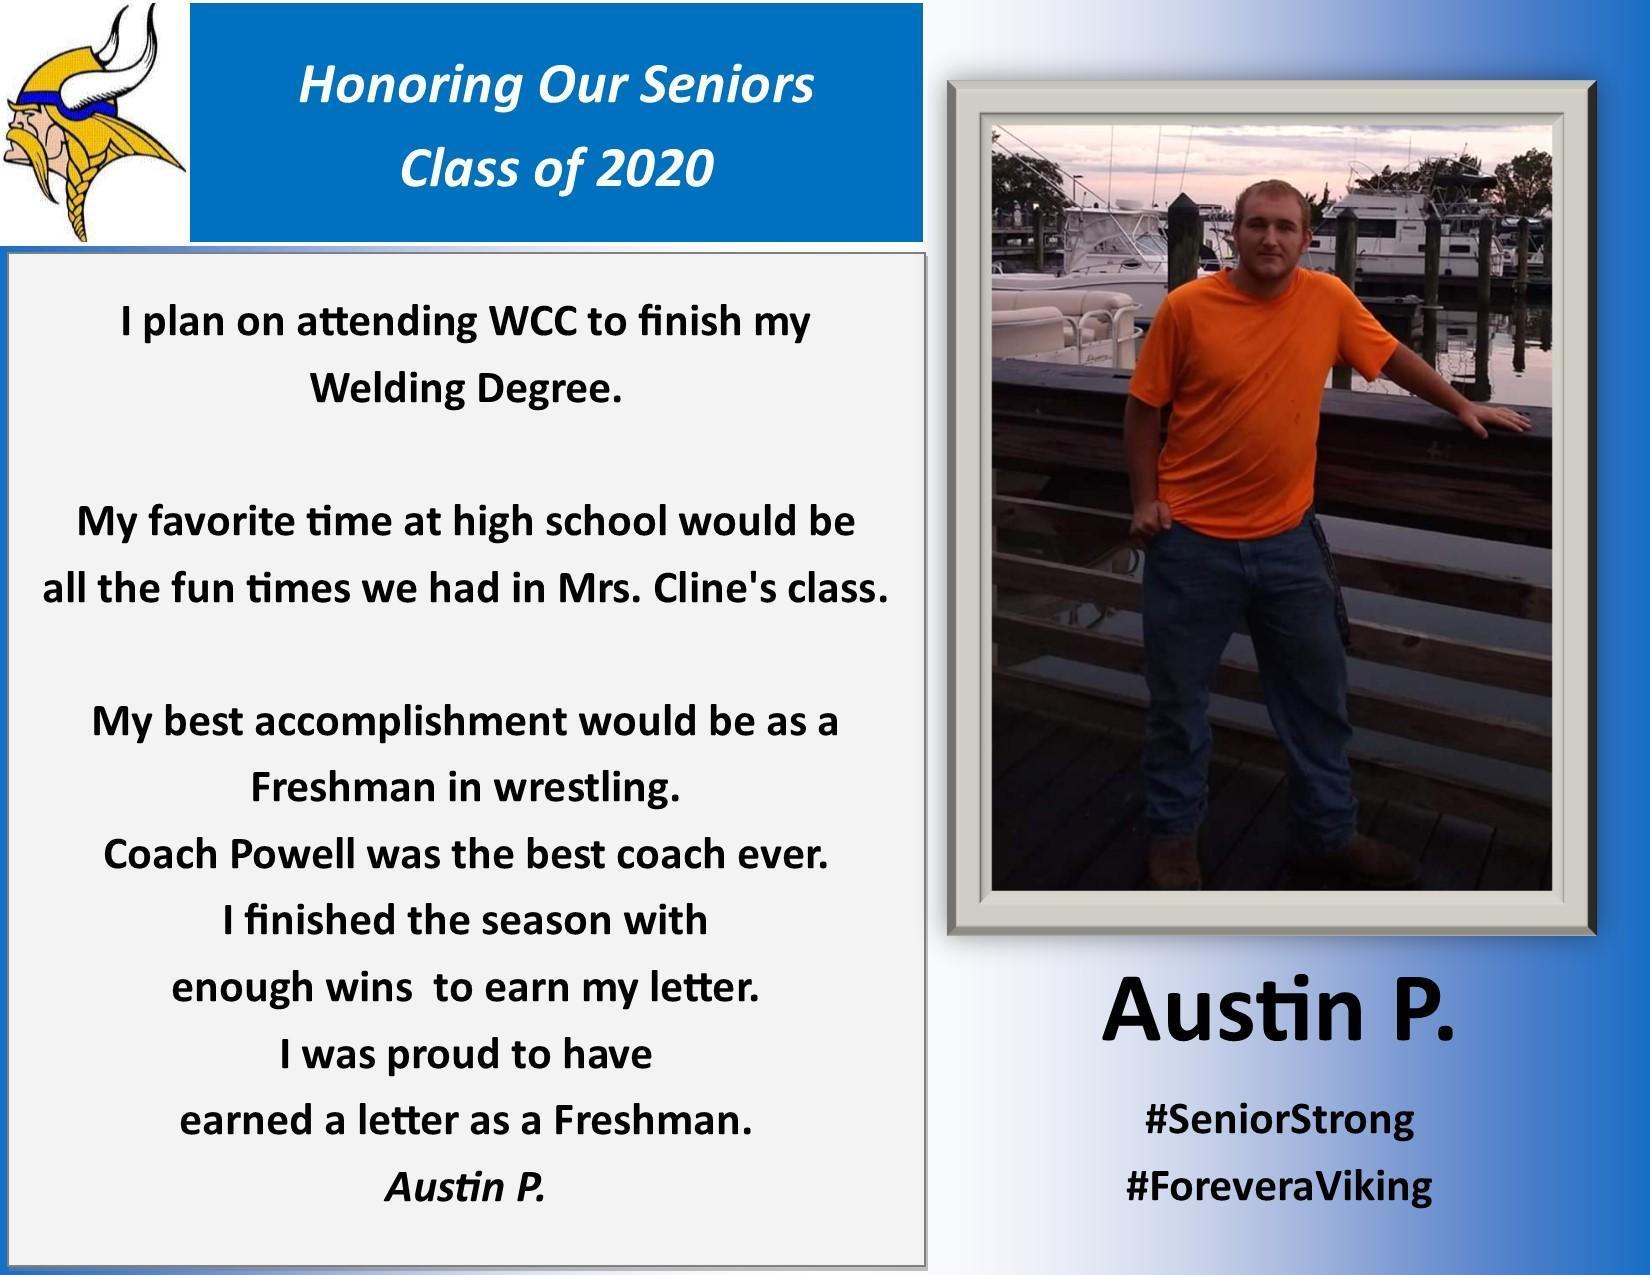 Austin P